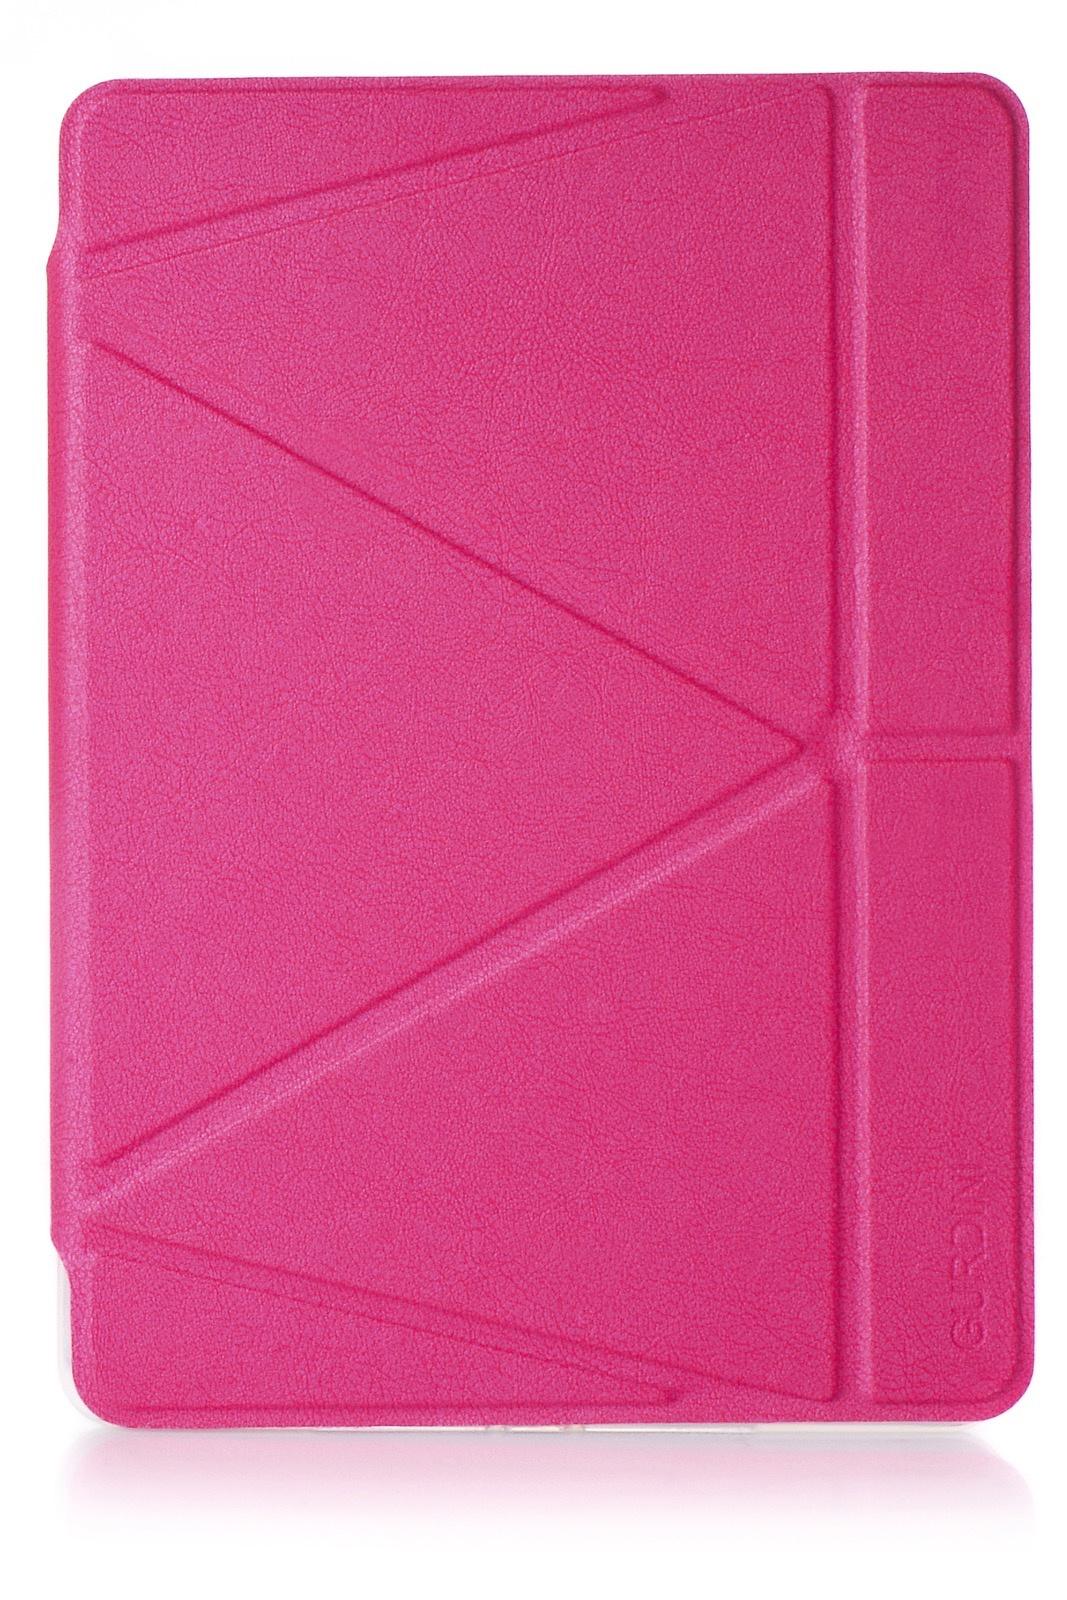 Чехол для планшета Gurdini Lights Series для Apple iPad Air 2, 660037, темно-розовый